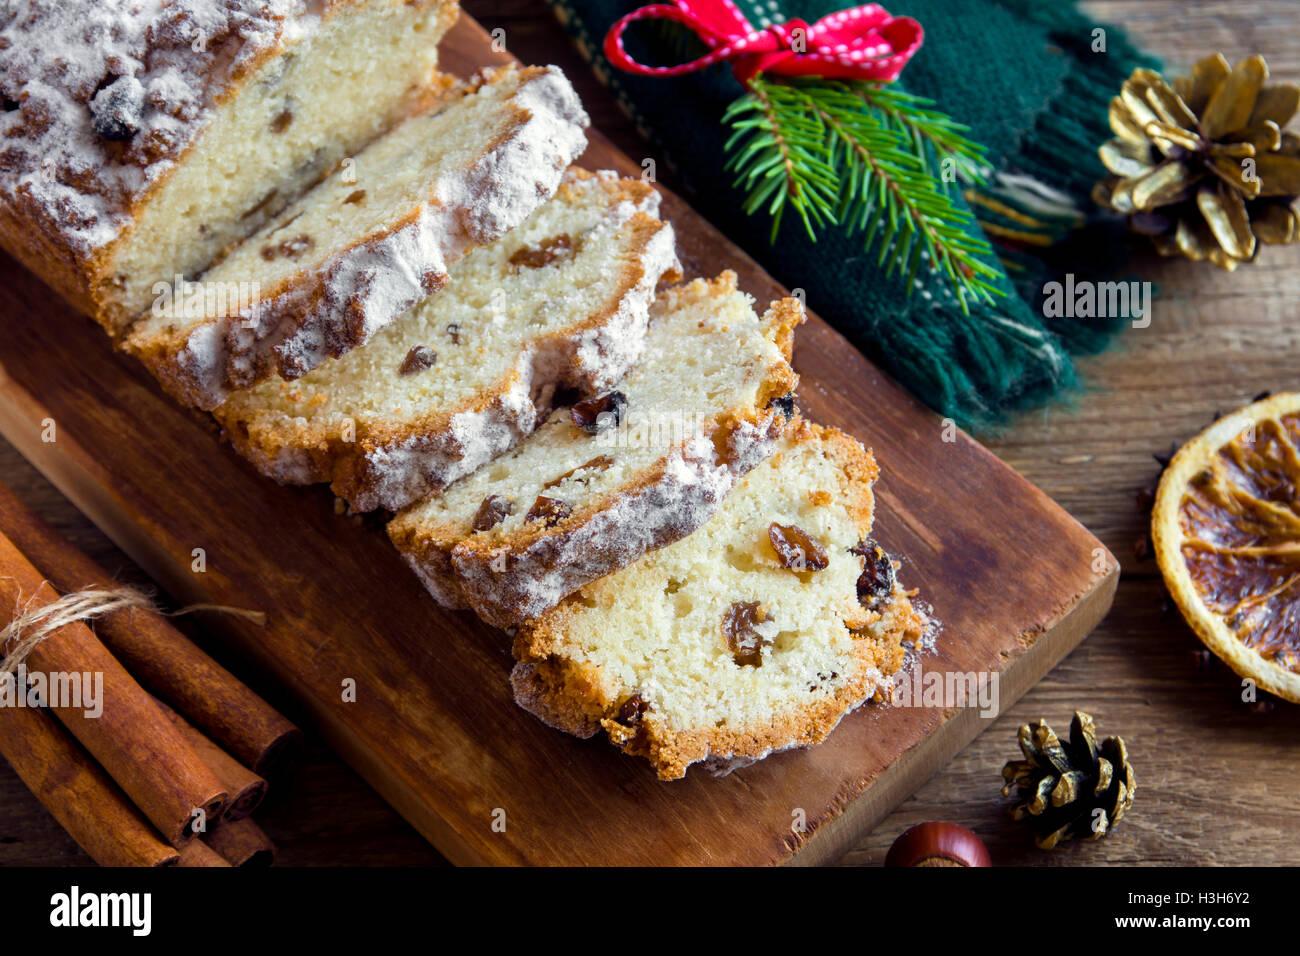 Christmas festive fruit bread (cake) on rustic wooden board - homemade Christmas bakery - Stock Image